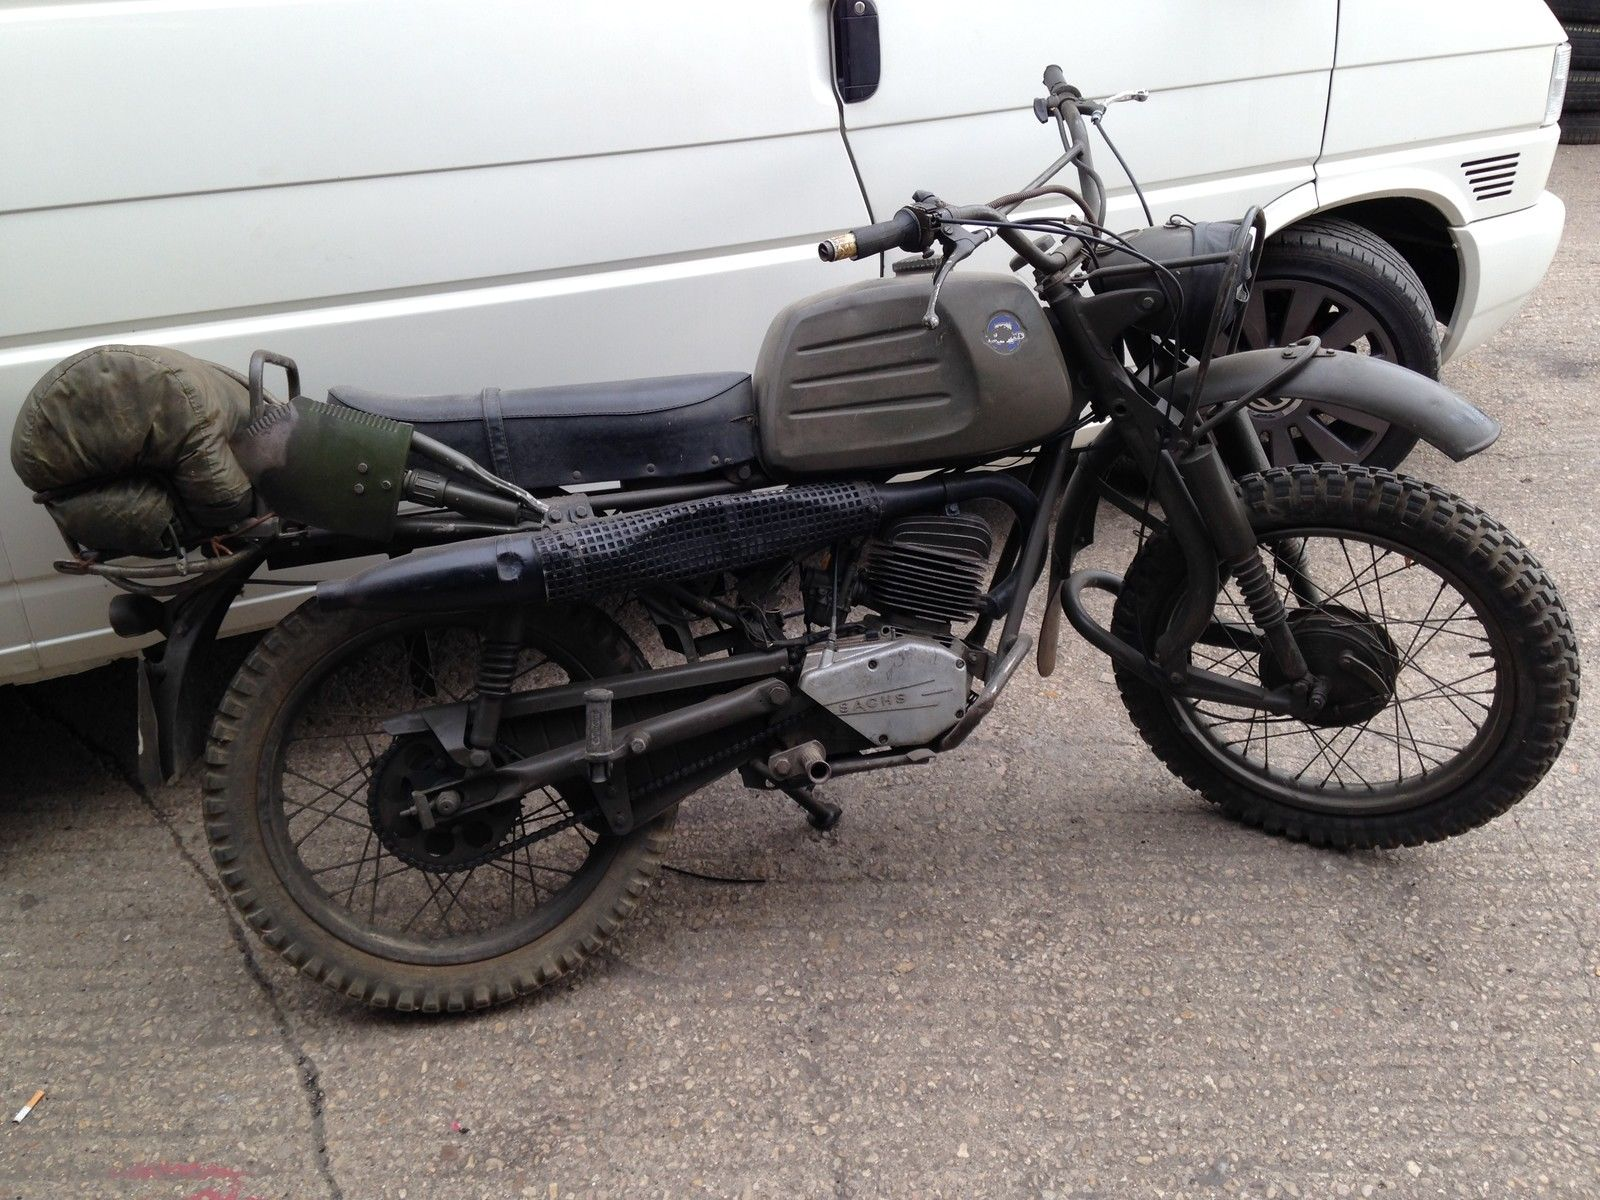 ex military german motorcycle sachs hercules k125 army bike project ...